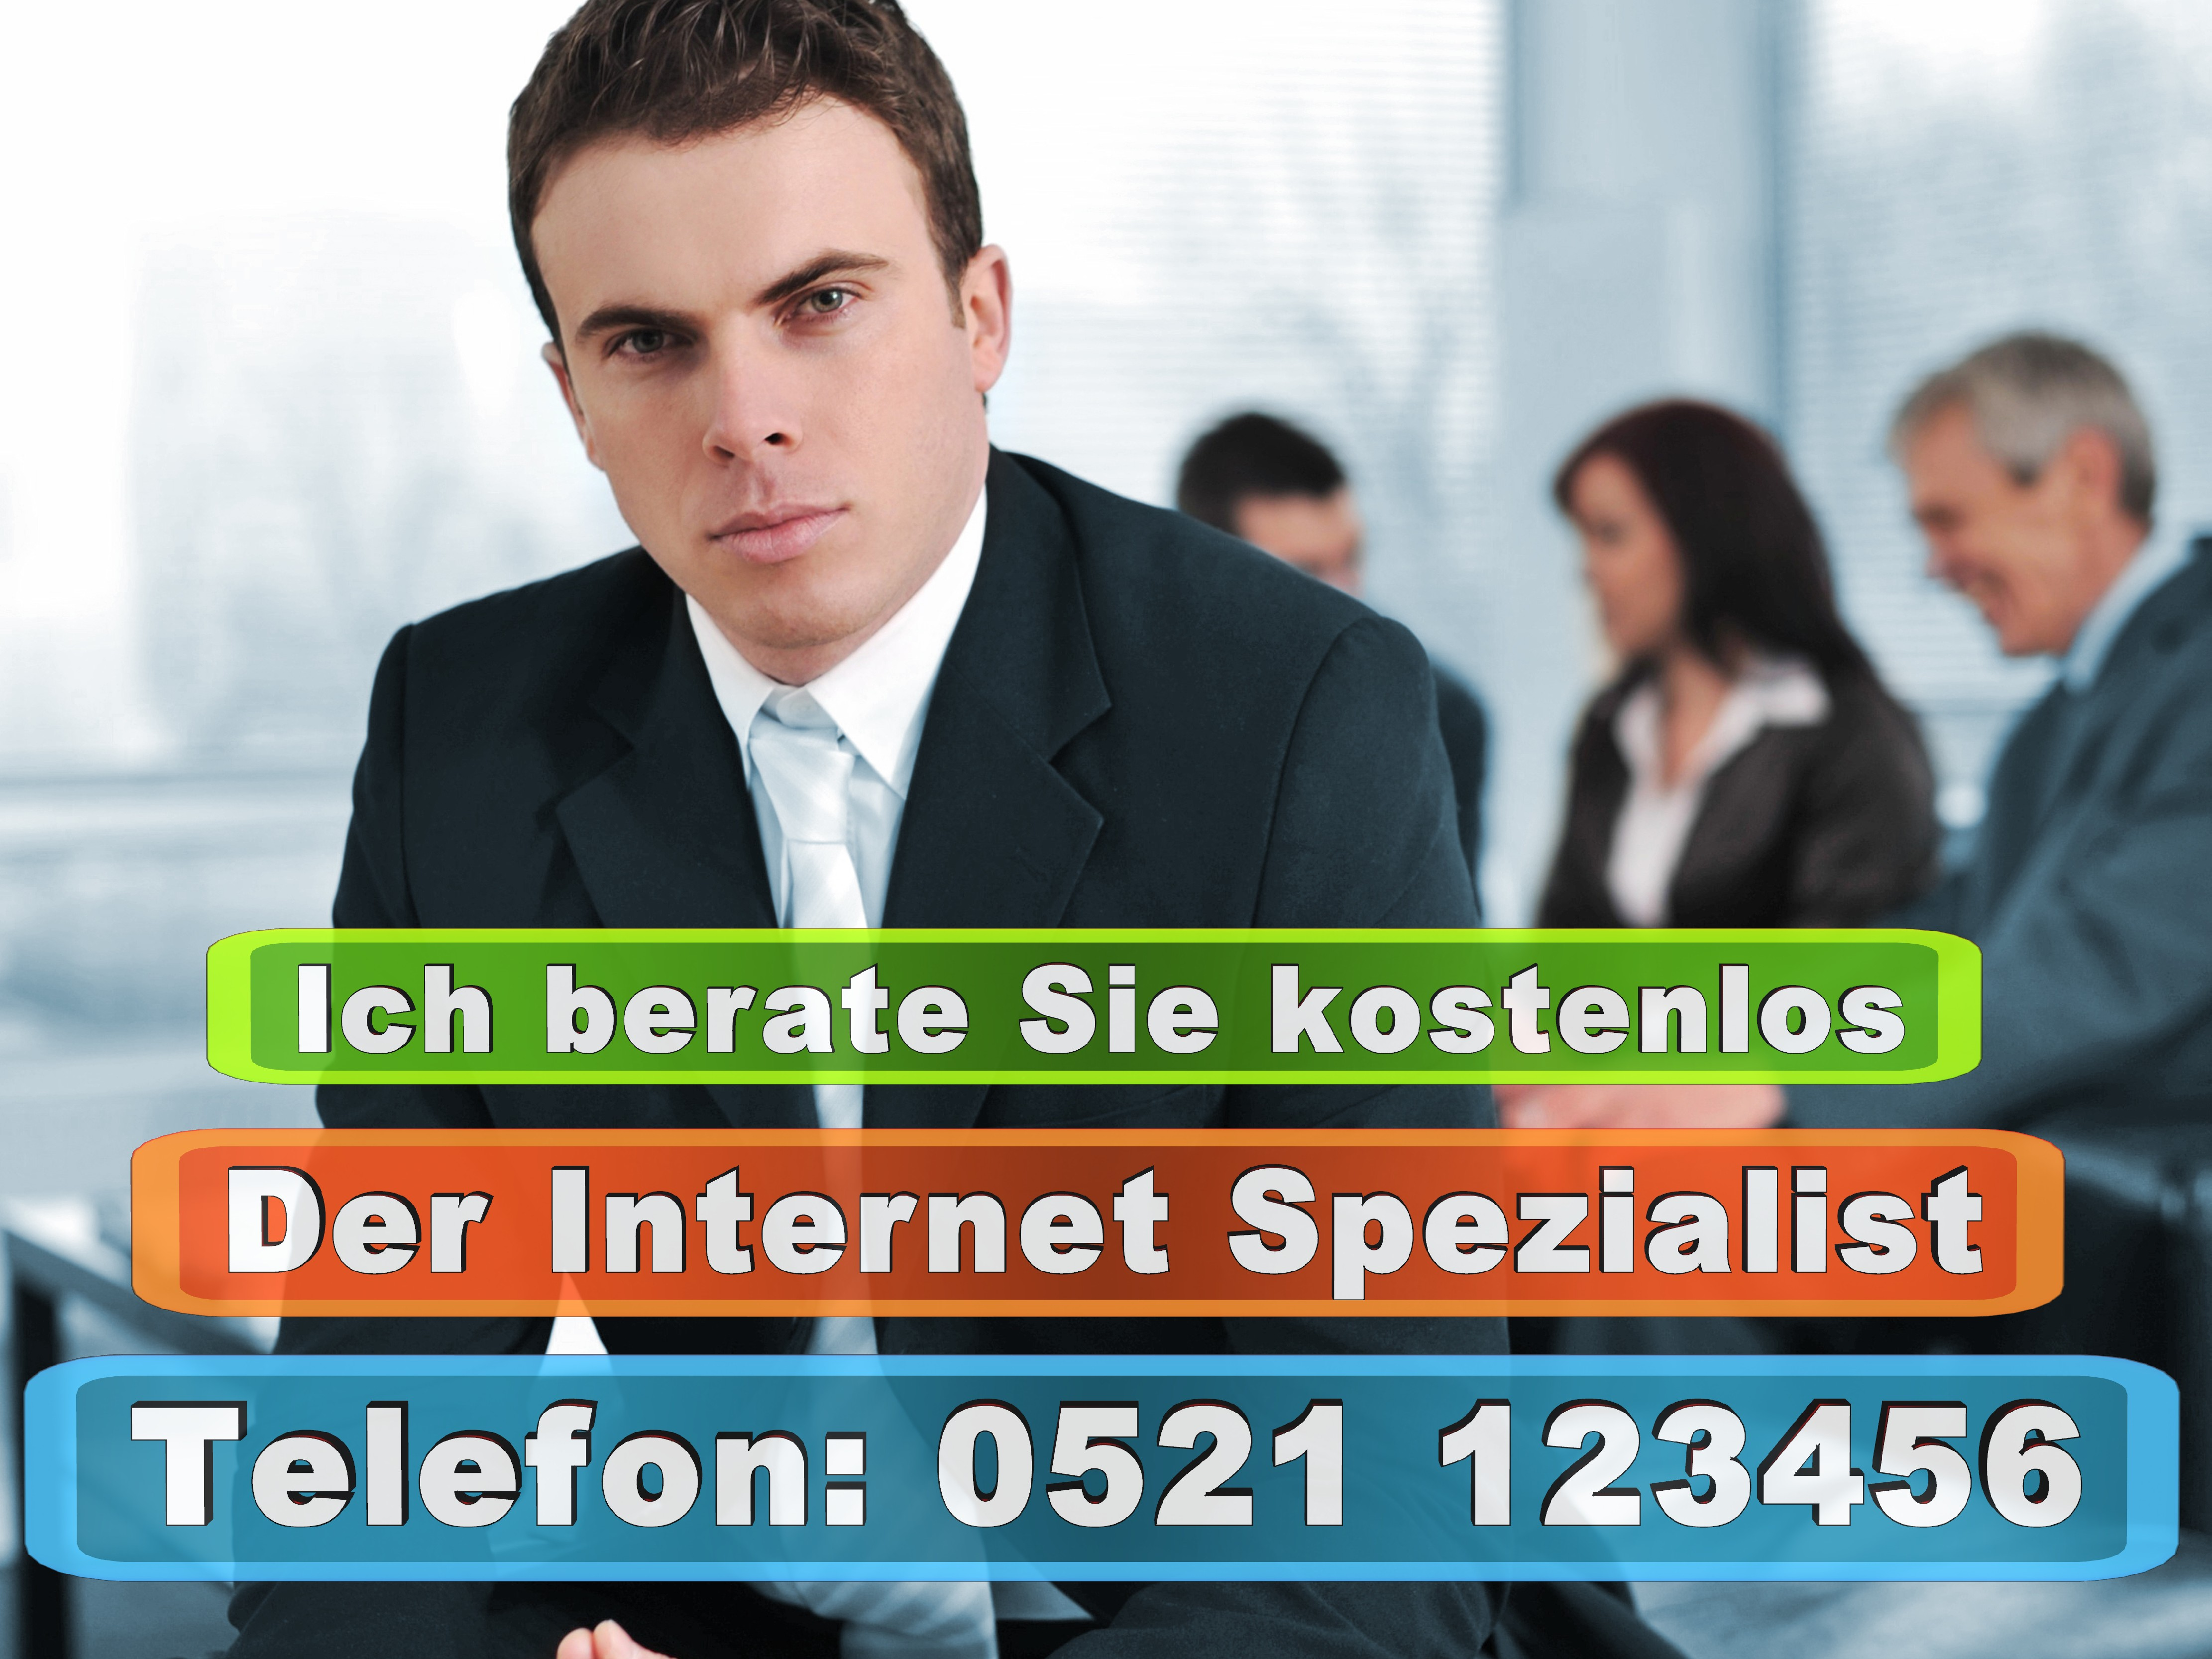 Rechtsanwalt In Bielefeld Steuerberater NRW OWL Paderborn Münster Dortmund Berlin Hamburg Düsseldorf Köln (7)